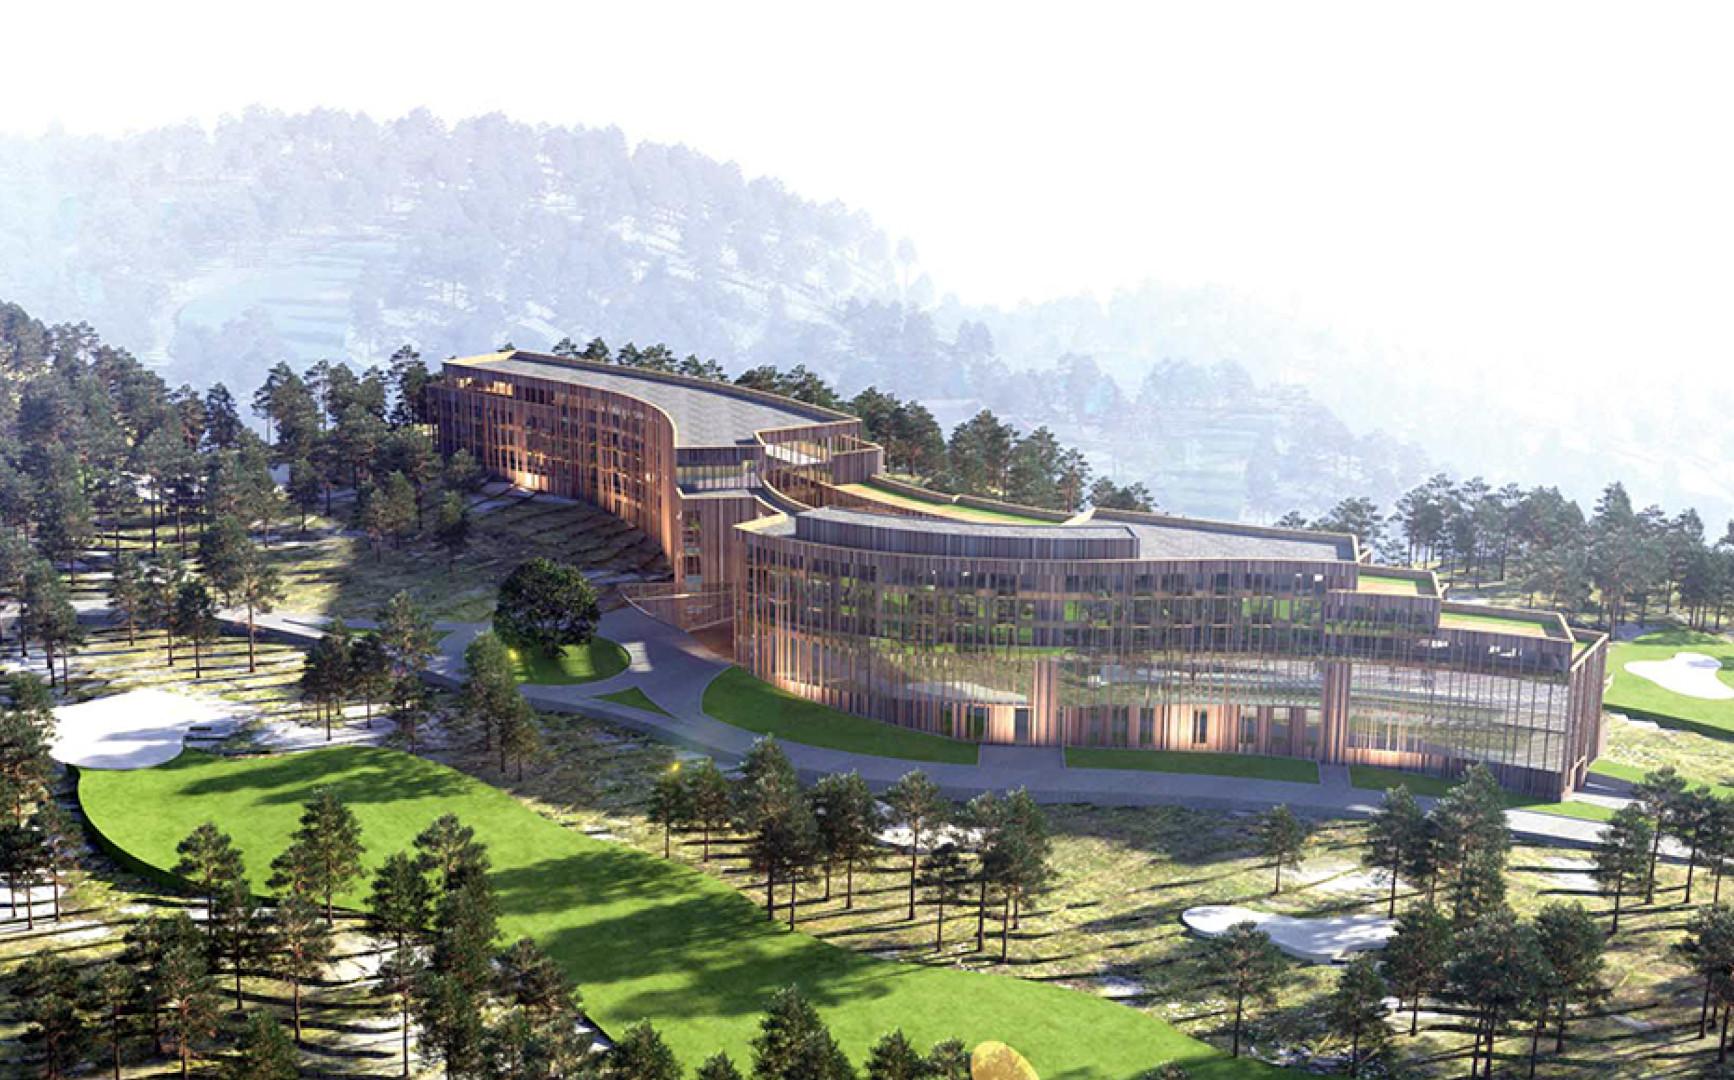 Tabori Resorts